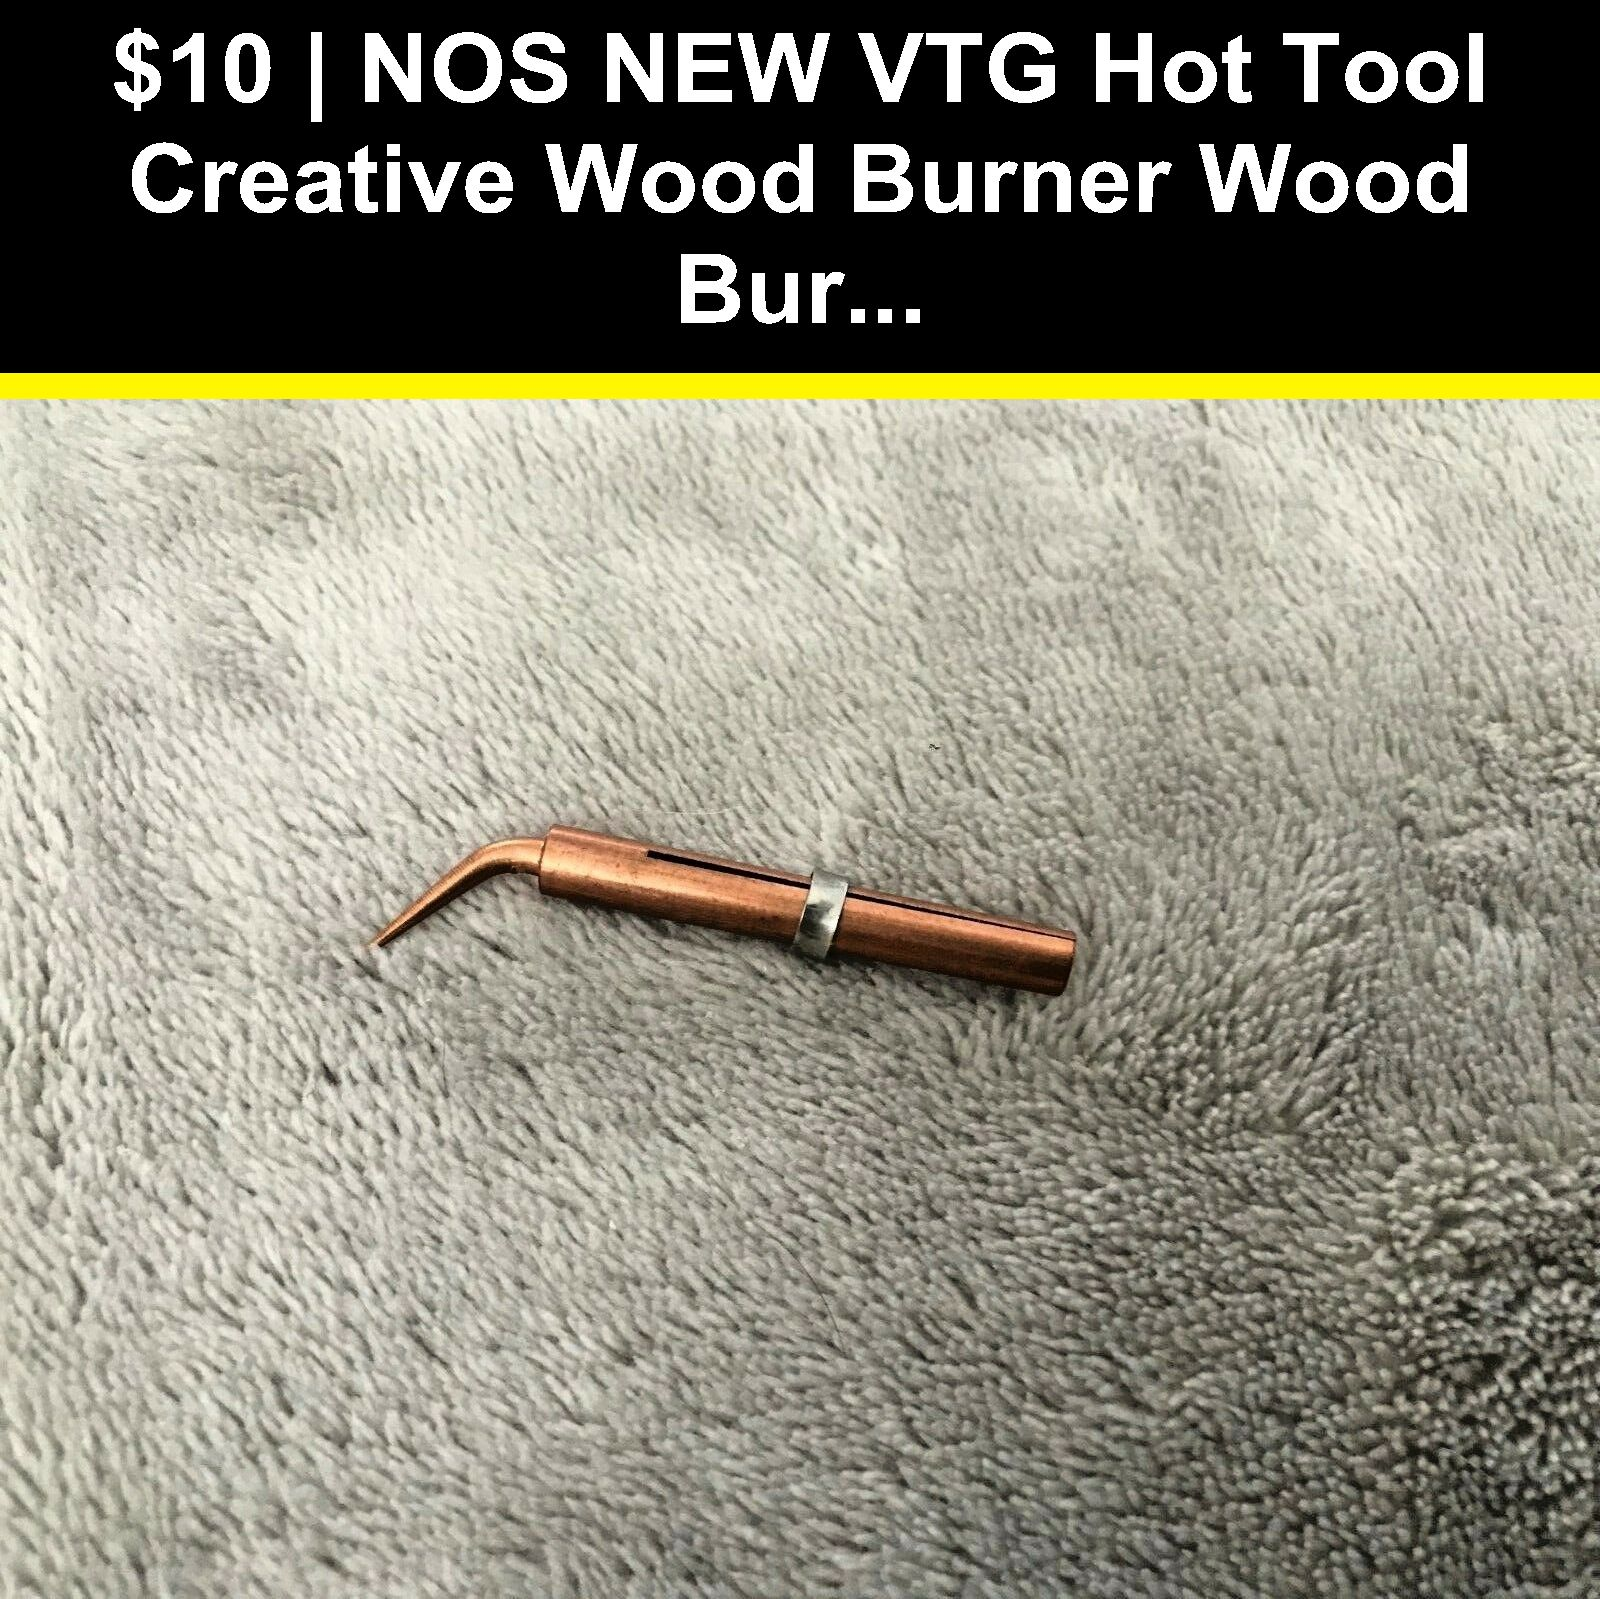 Wood Burning Pens 183150 Nos New Vtg Hot Tool Creative Wood Burner Wood Burning Tip Point 8x Bent Stencil Buy It No Wood Burner Wood Burning Tips Hot Tools